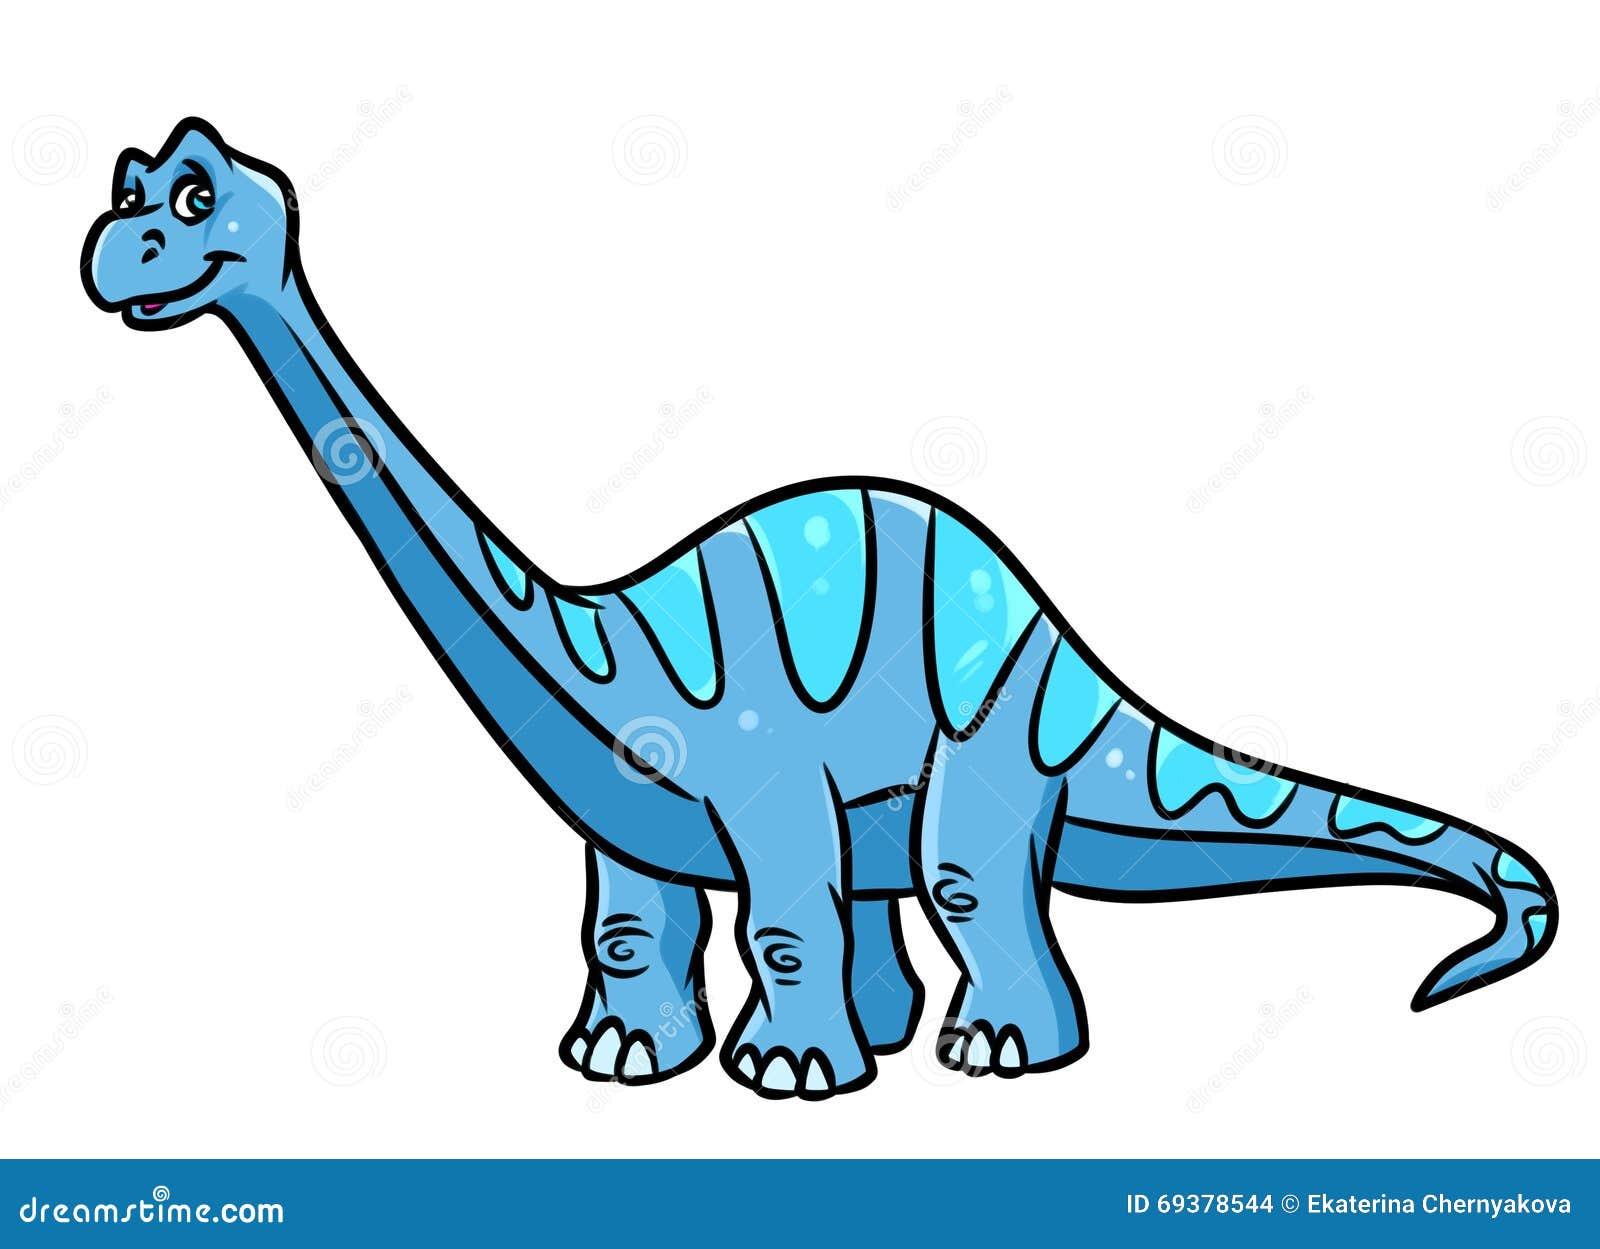 dinosaur diplodocus herbivorous cartoon illustration stock images